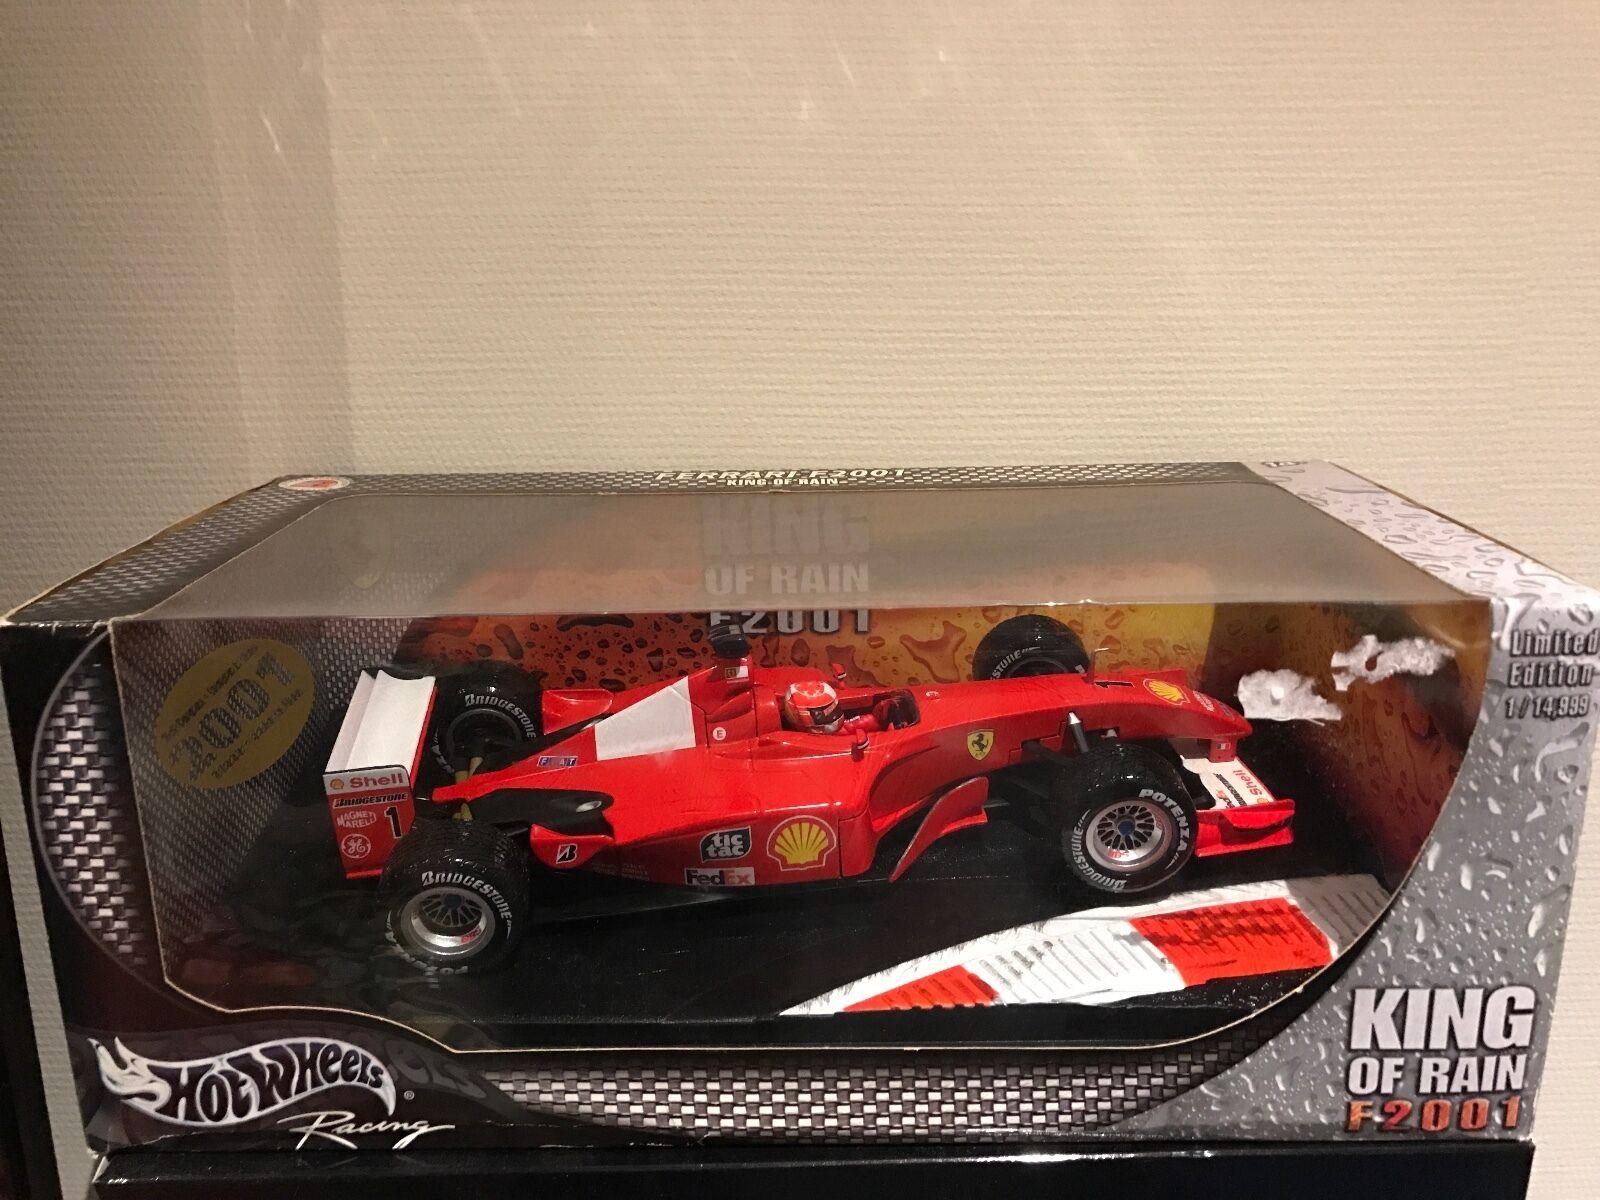 Ferrari F2001 King of Rain M. Schumacher scale 1 18 Hotwheels with box